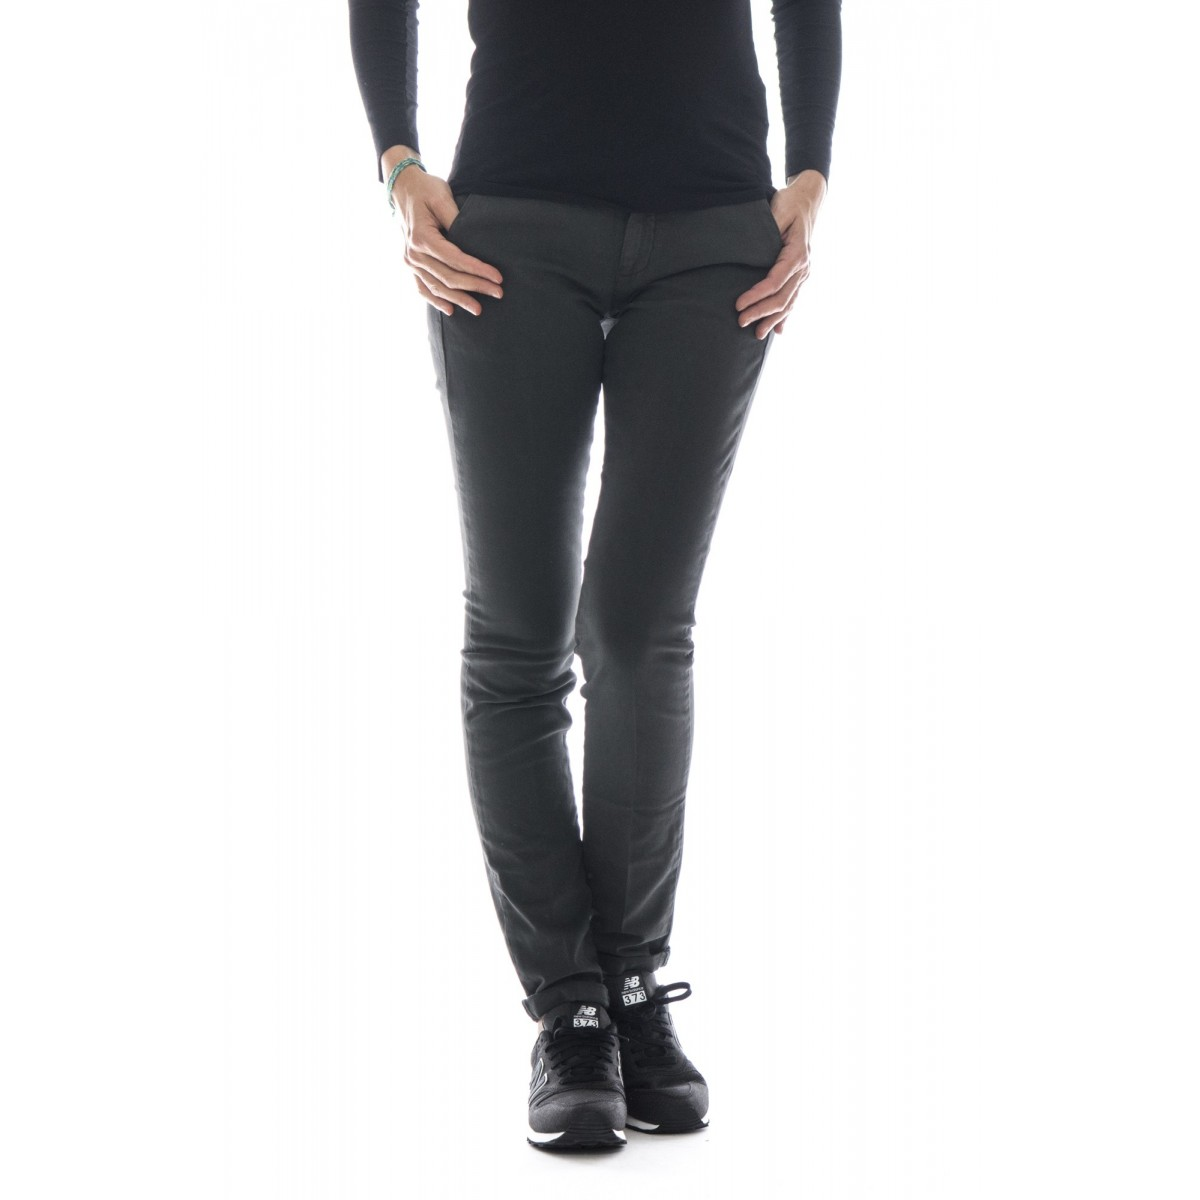 Pantalone donna - Melita 428 gabardina